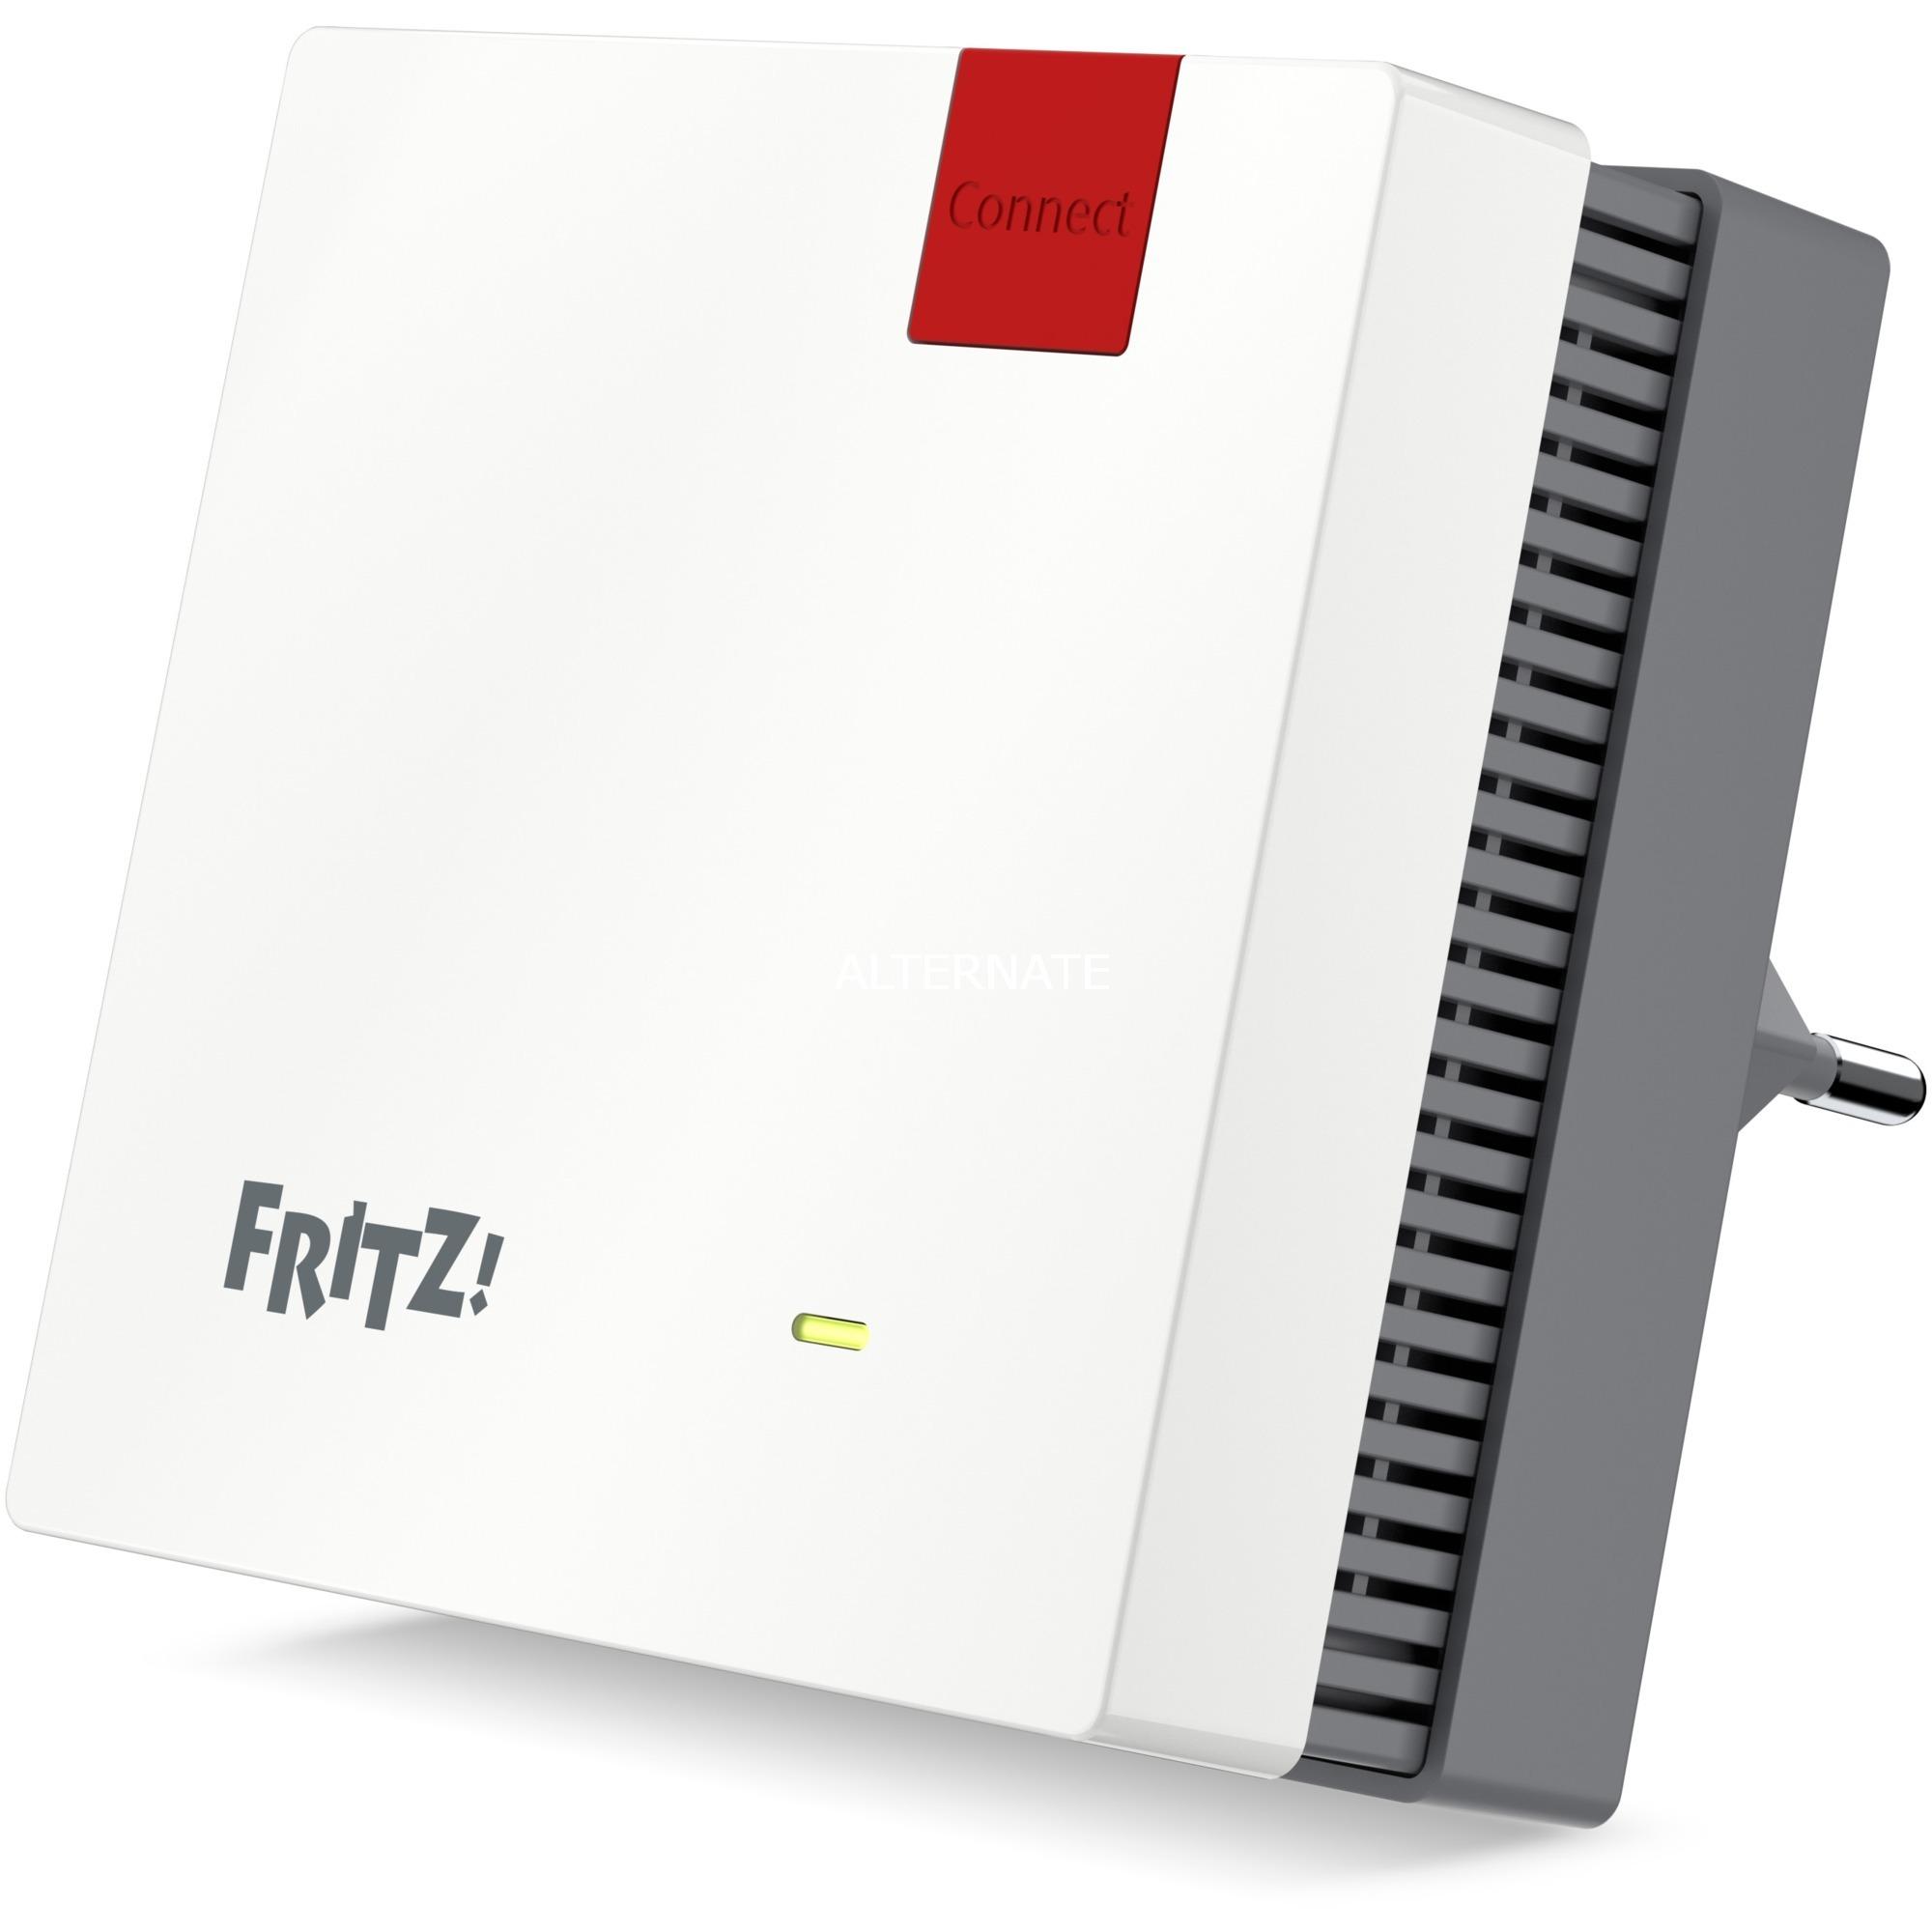 FRITZ!Repeater 1200 punto de acceso WLAN 866 Mbit/s Blanco, Repetidor